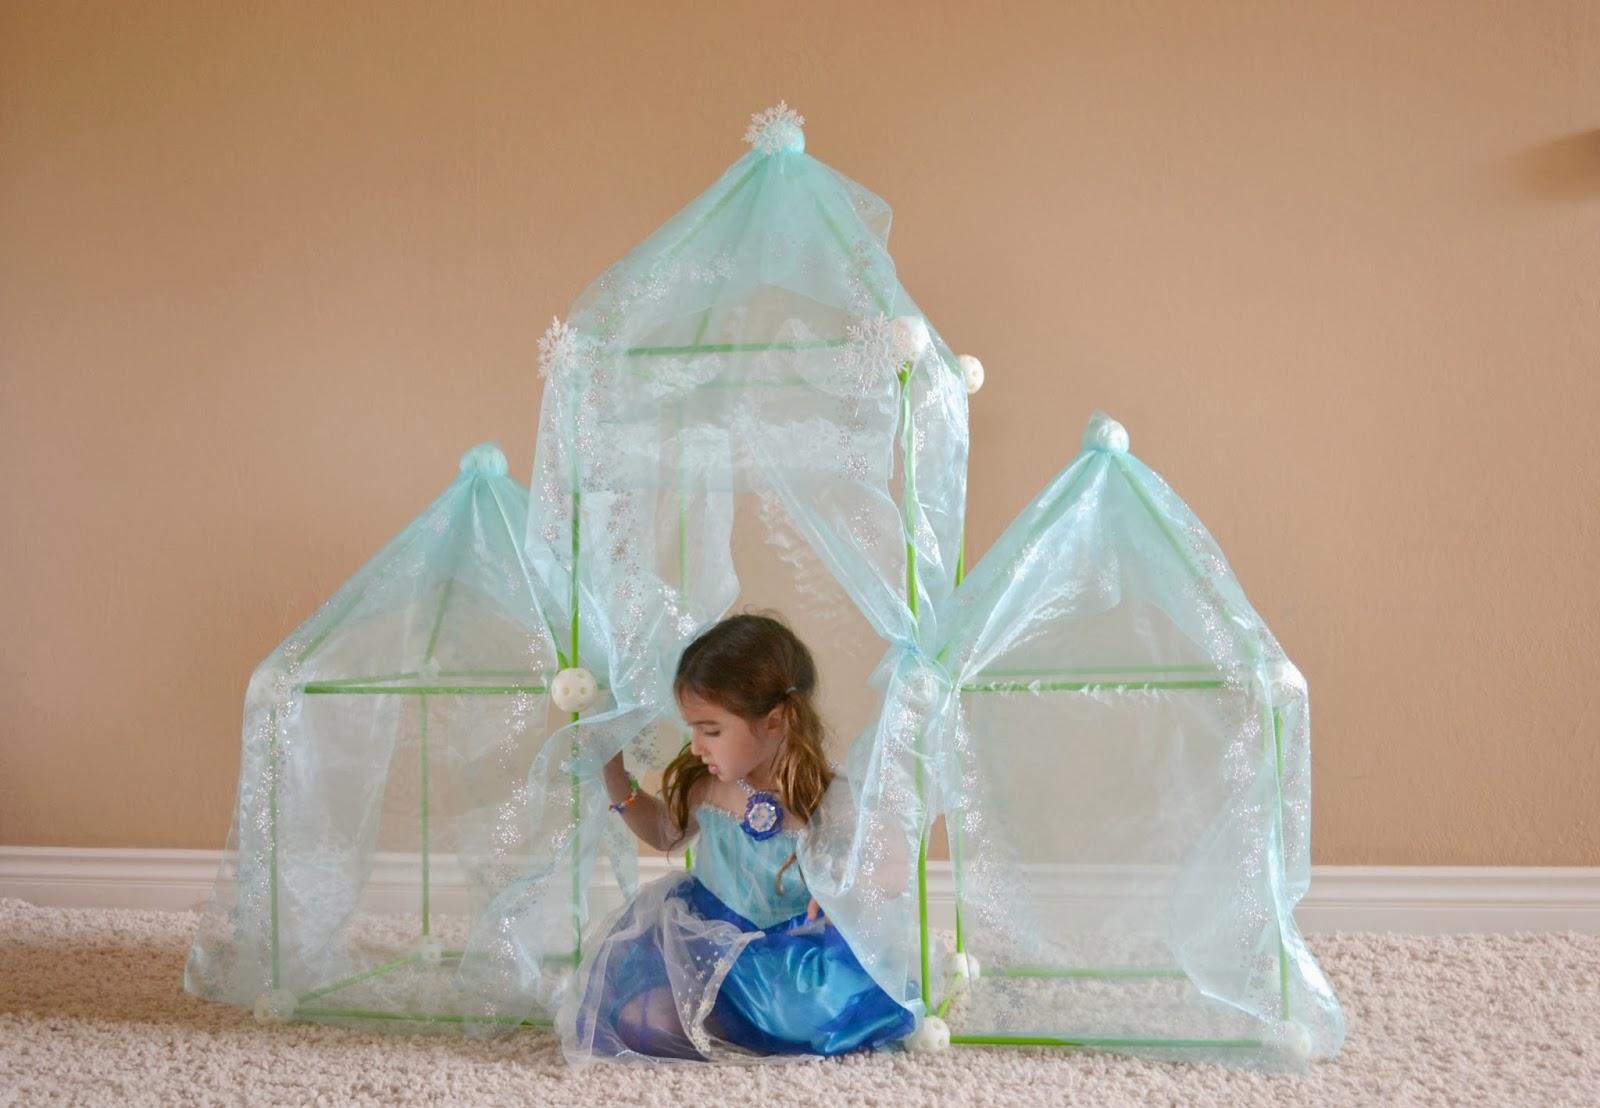 Mommy Testers, Disney Frozen Ice Palace, DIY FROZEN Ice Castle, DIY Frozen Ice Palace, DIY Disney Frozen Castle, How to make an ice palace fort